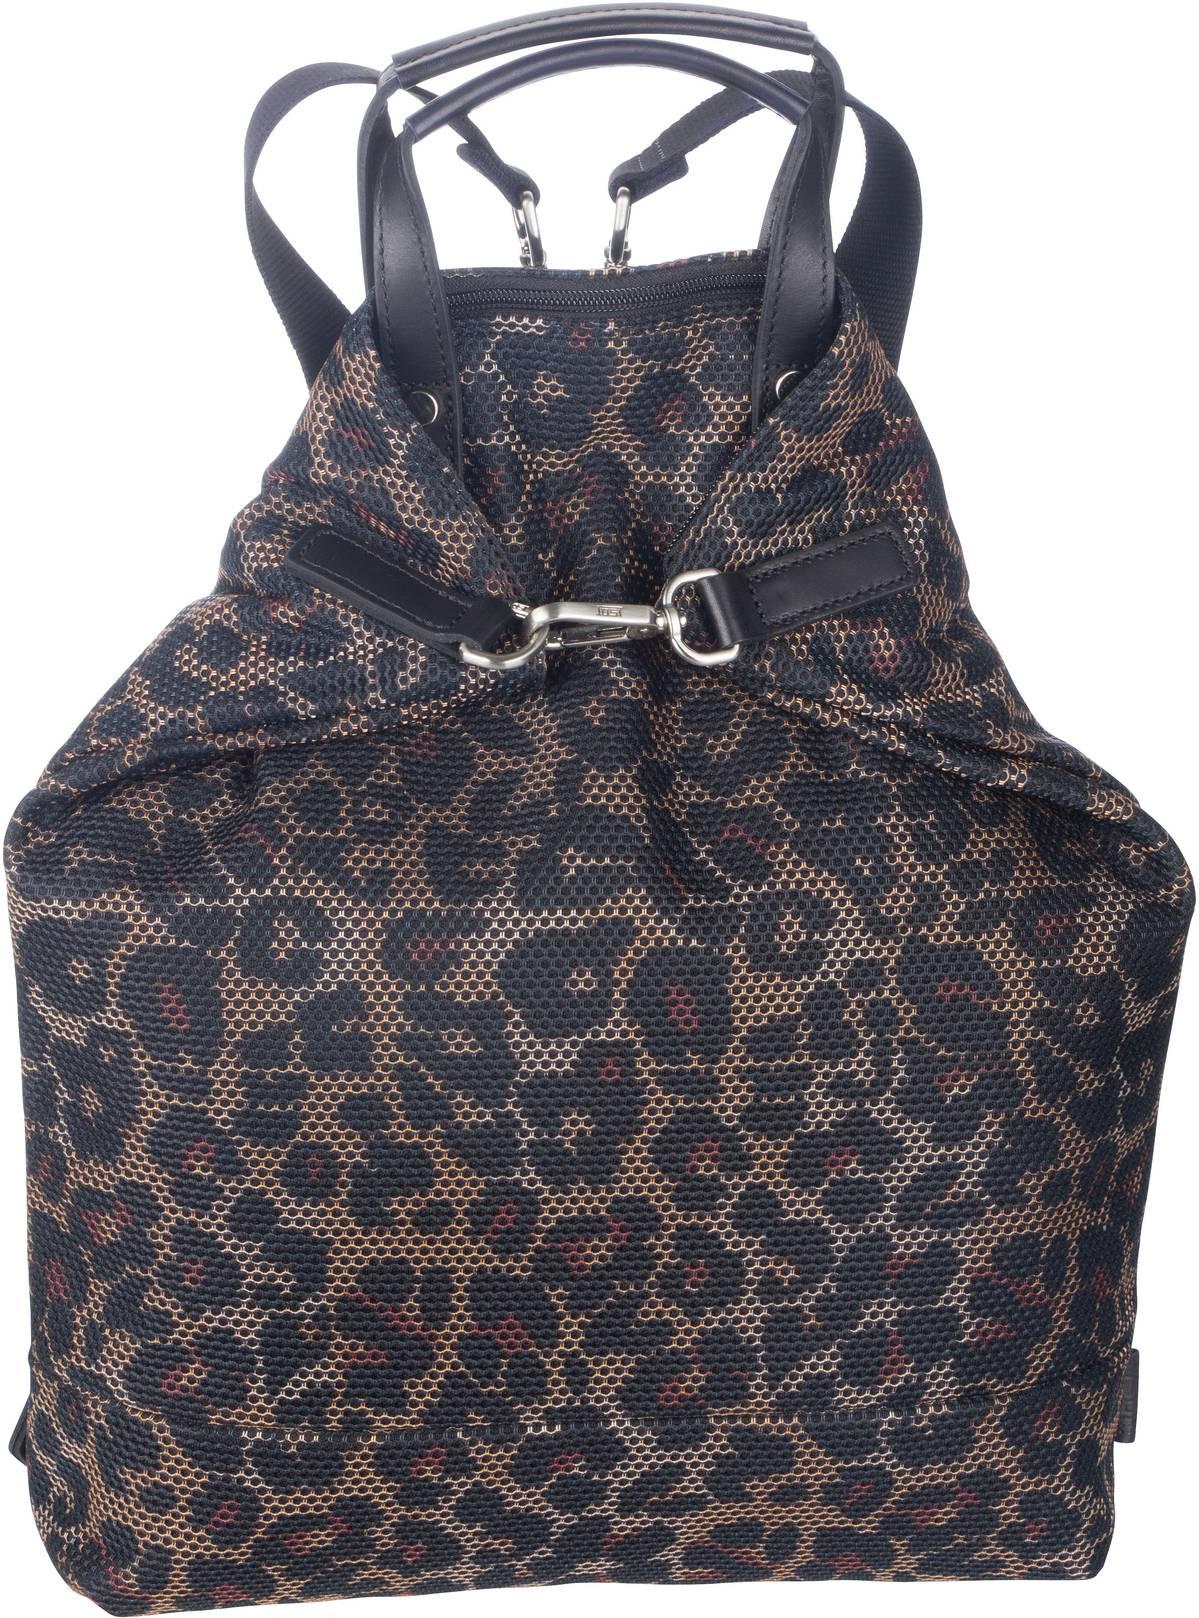 Rucksack / Daypack Mesh 6178 X-Change 3in1 Bag S Leo